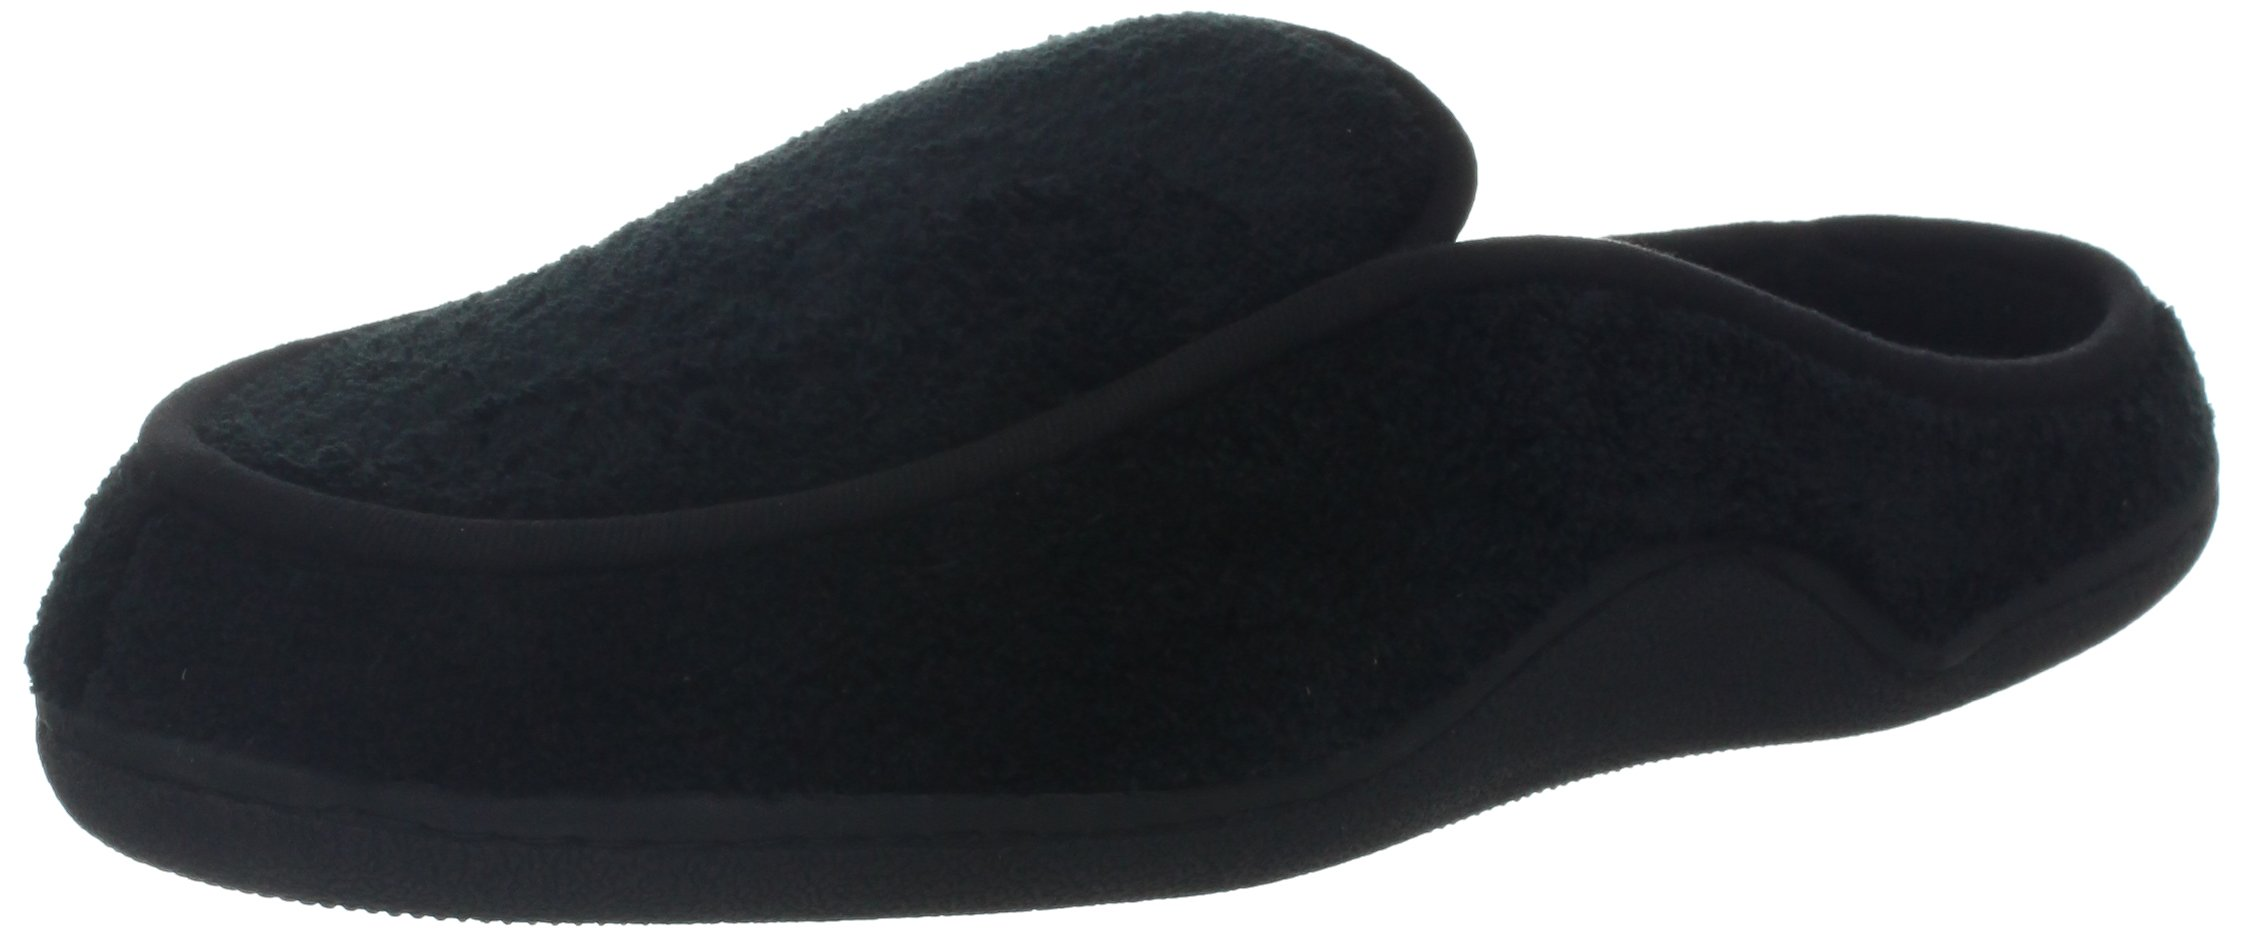 Isotoner Men's Terry Slip On Clog Slipper with Memory Foam for Indoor/Outdoor Comfort, X-Large/11-12 D(M) US, Black